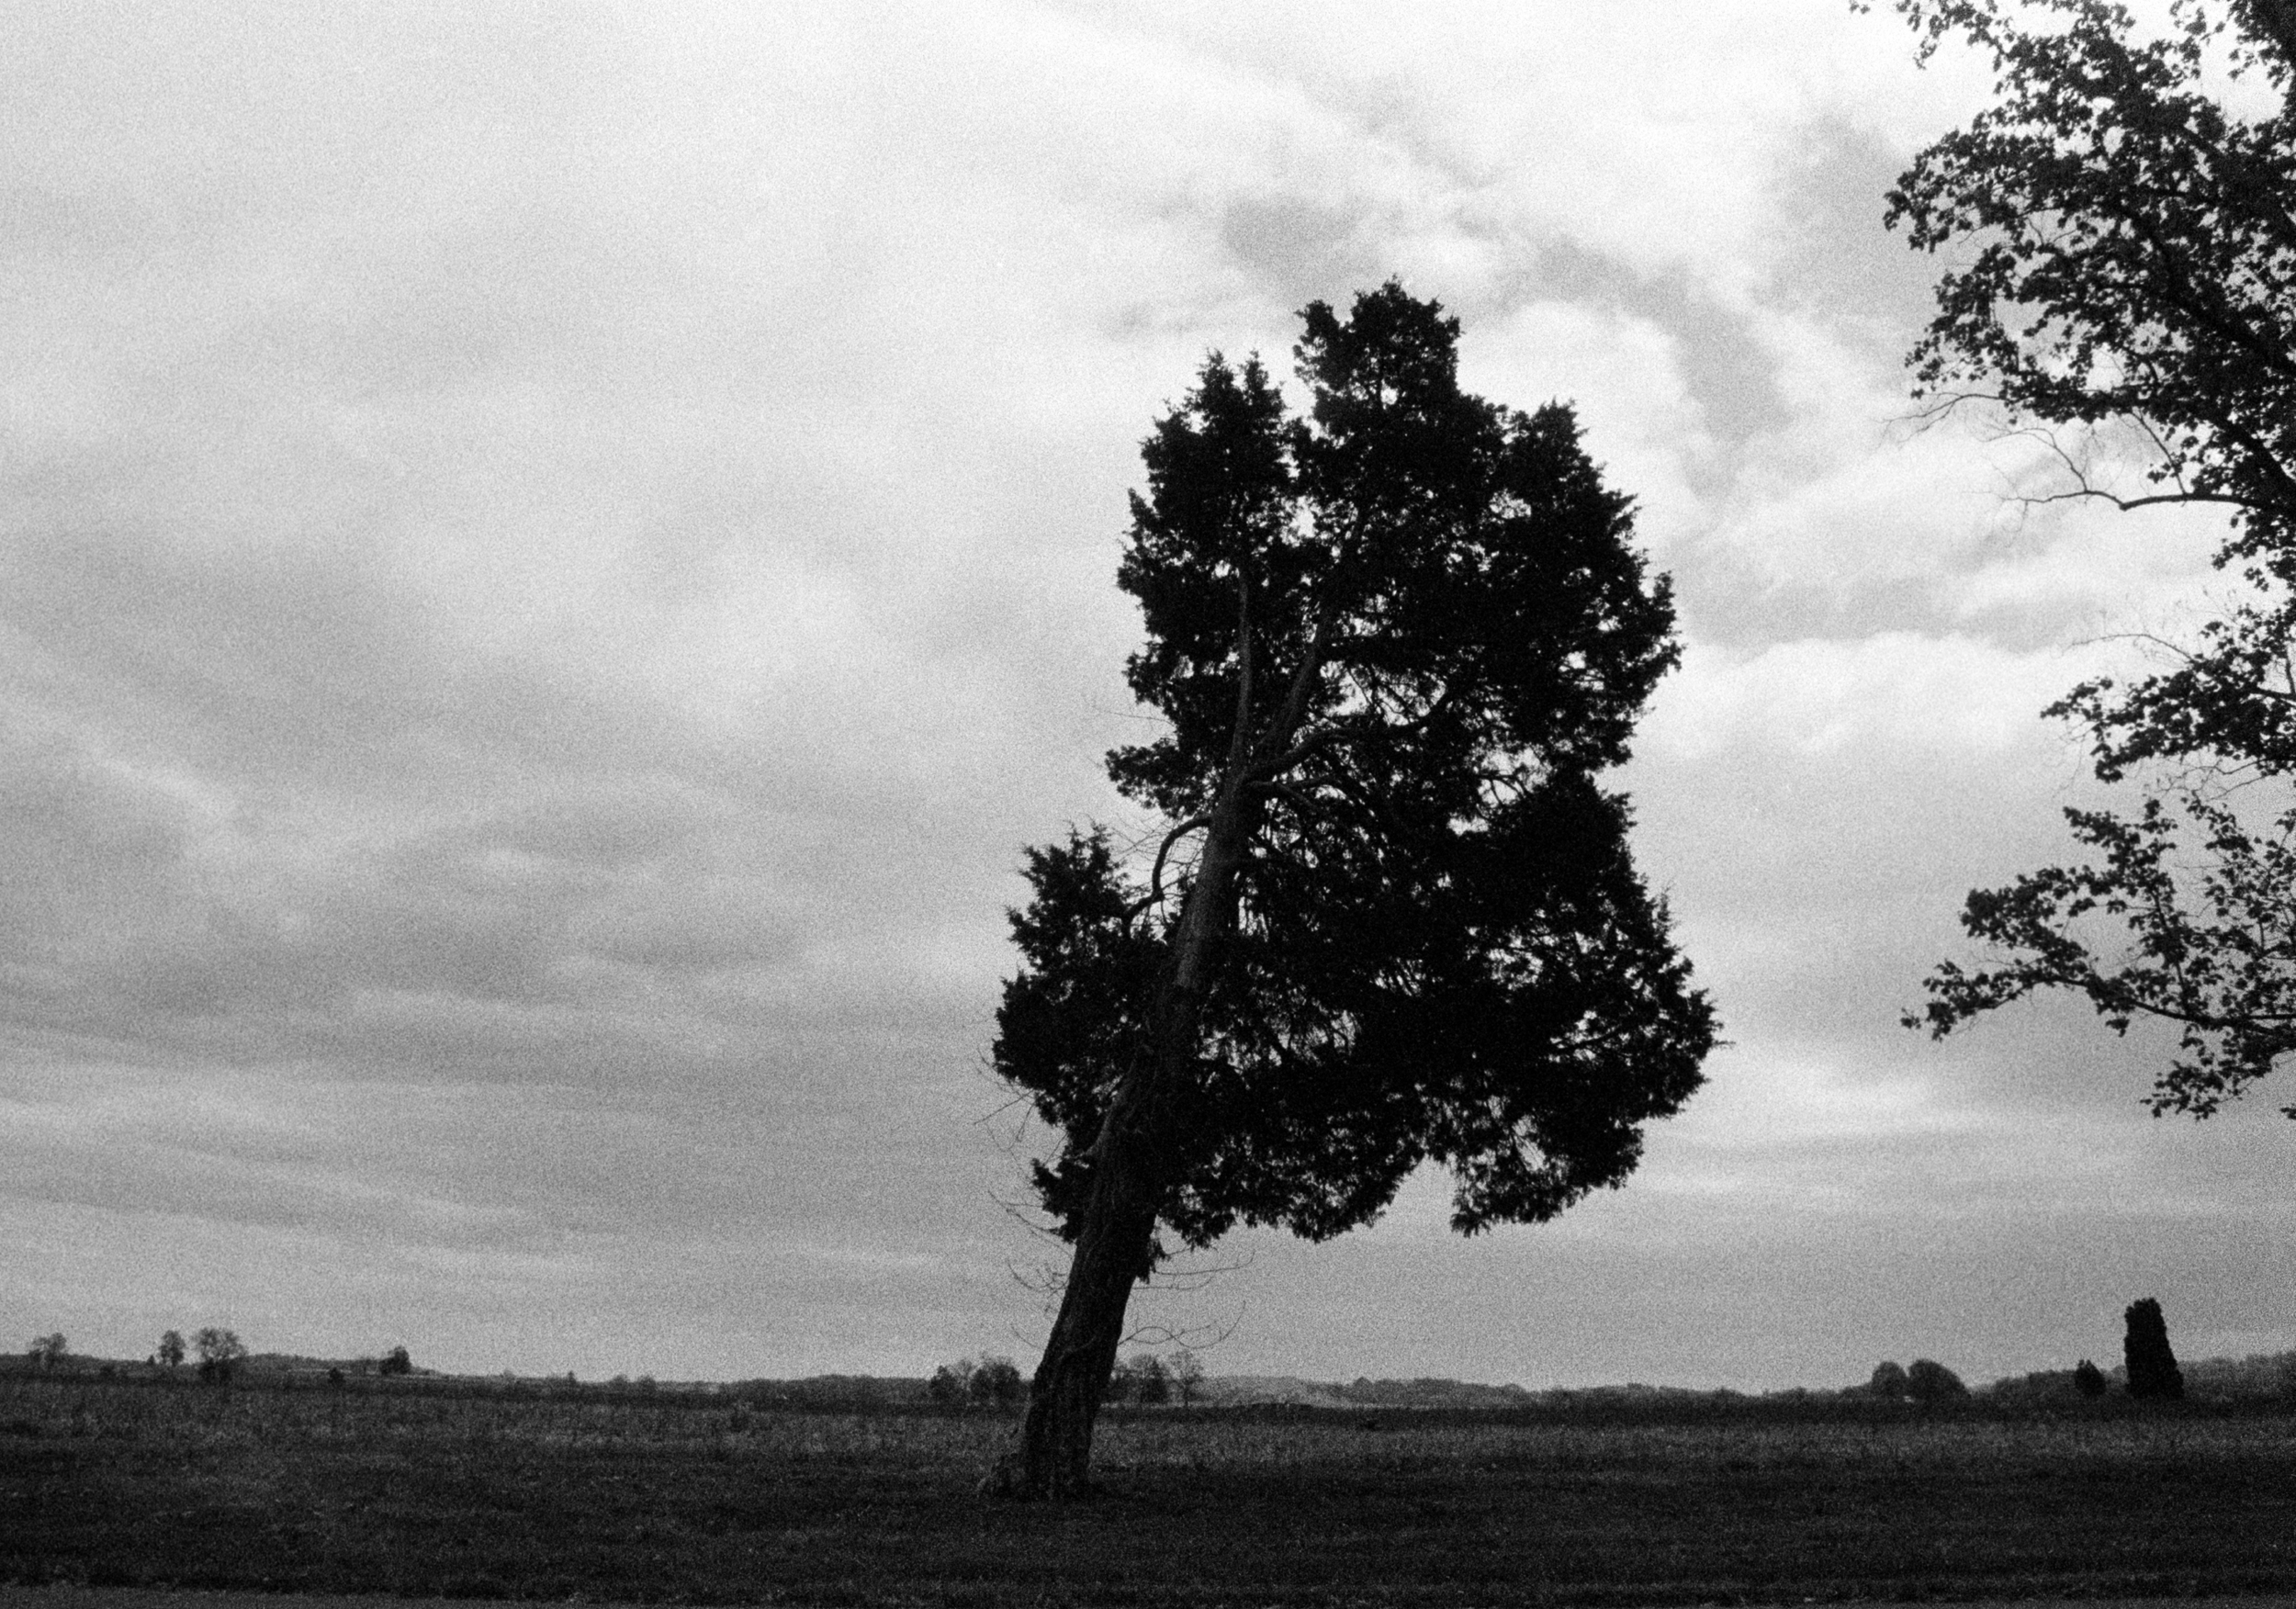 Landscape 10, Gettysburg, PA